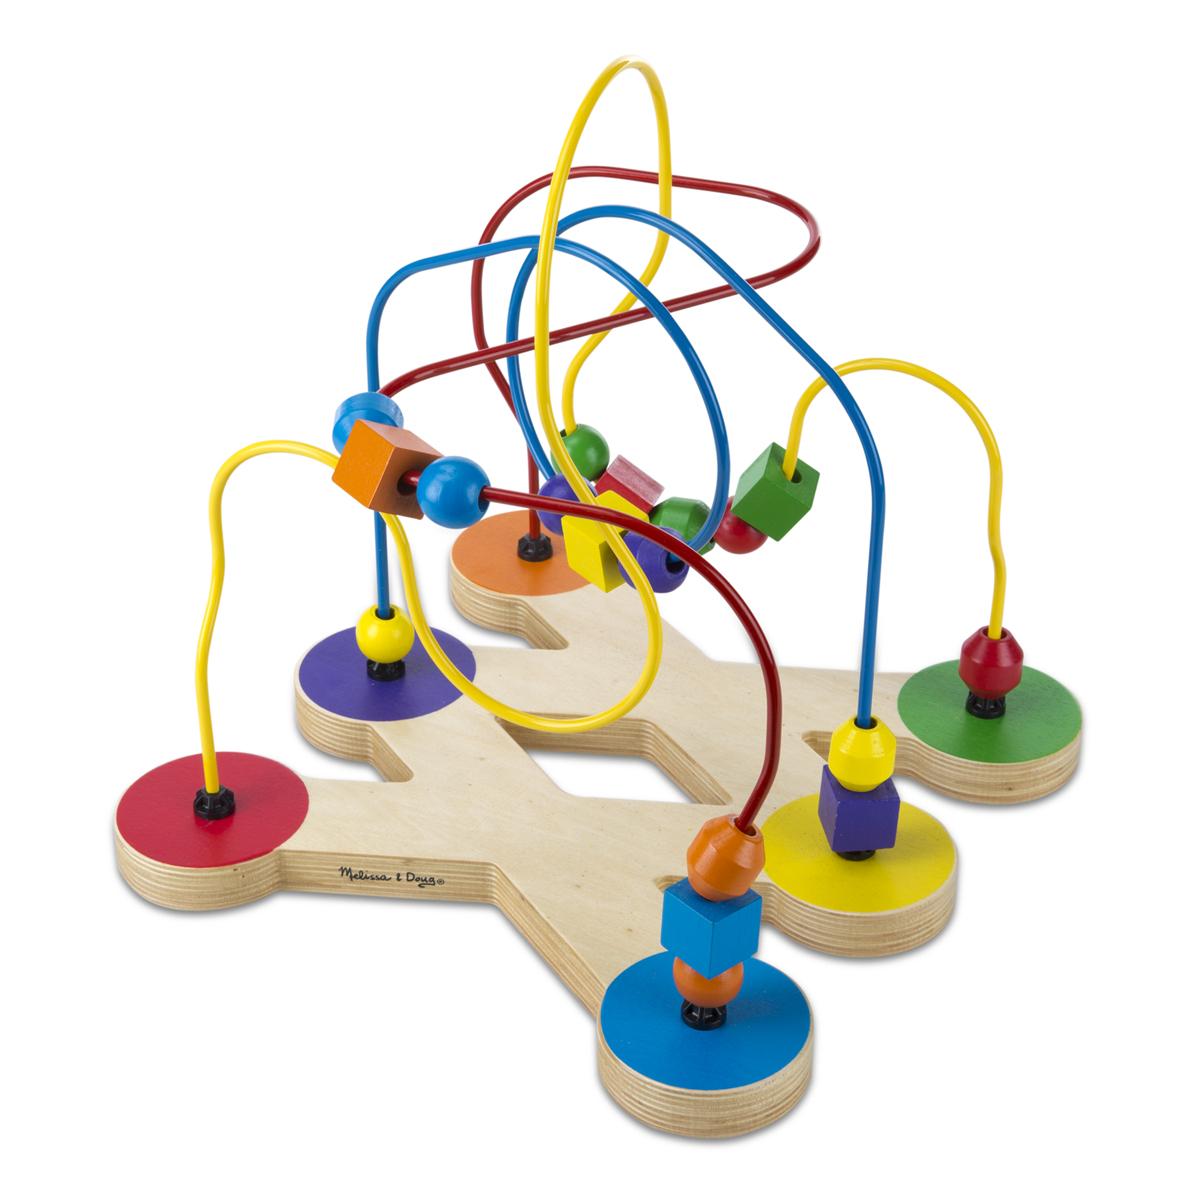 Melissa & Doug Classic Toy Bead Maze 2281